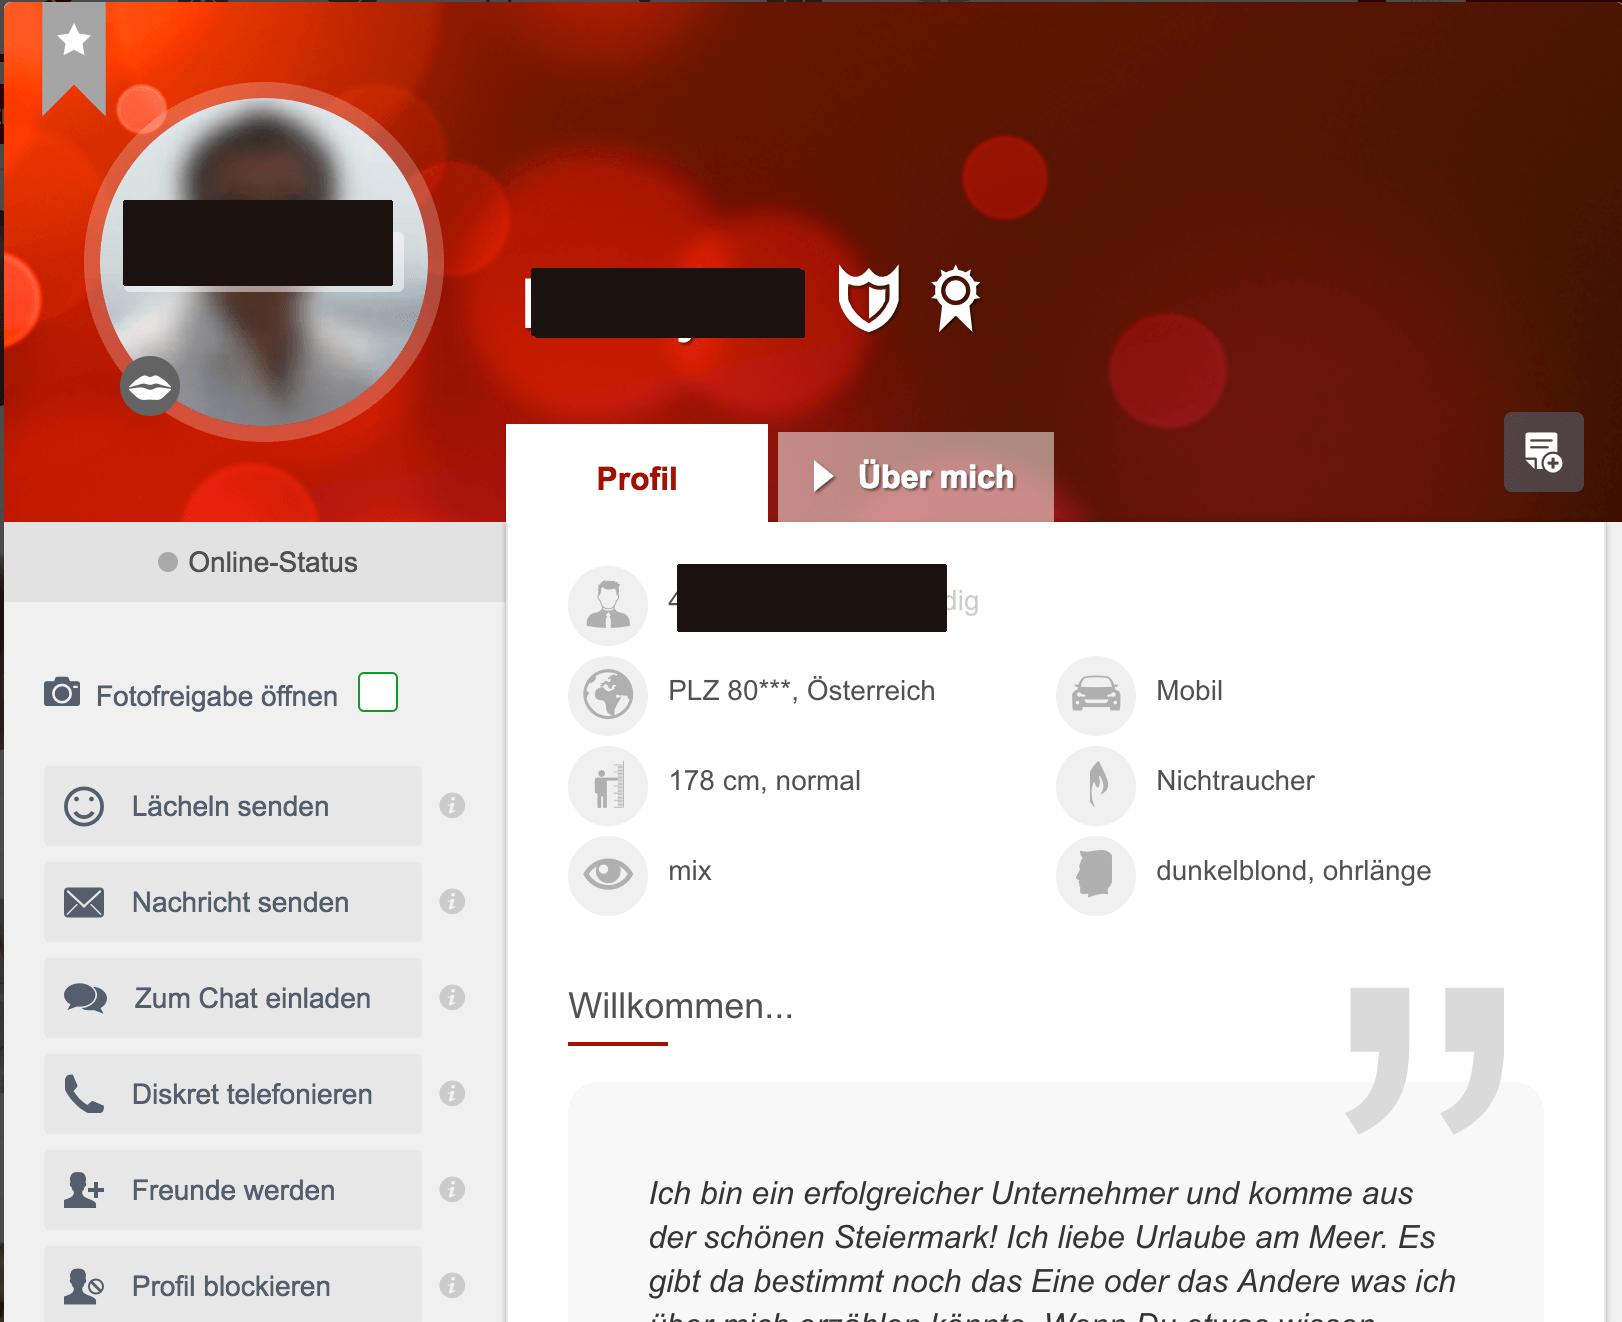 Lovepoint Profil